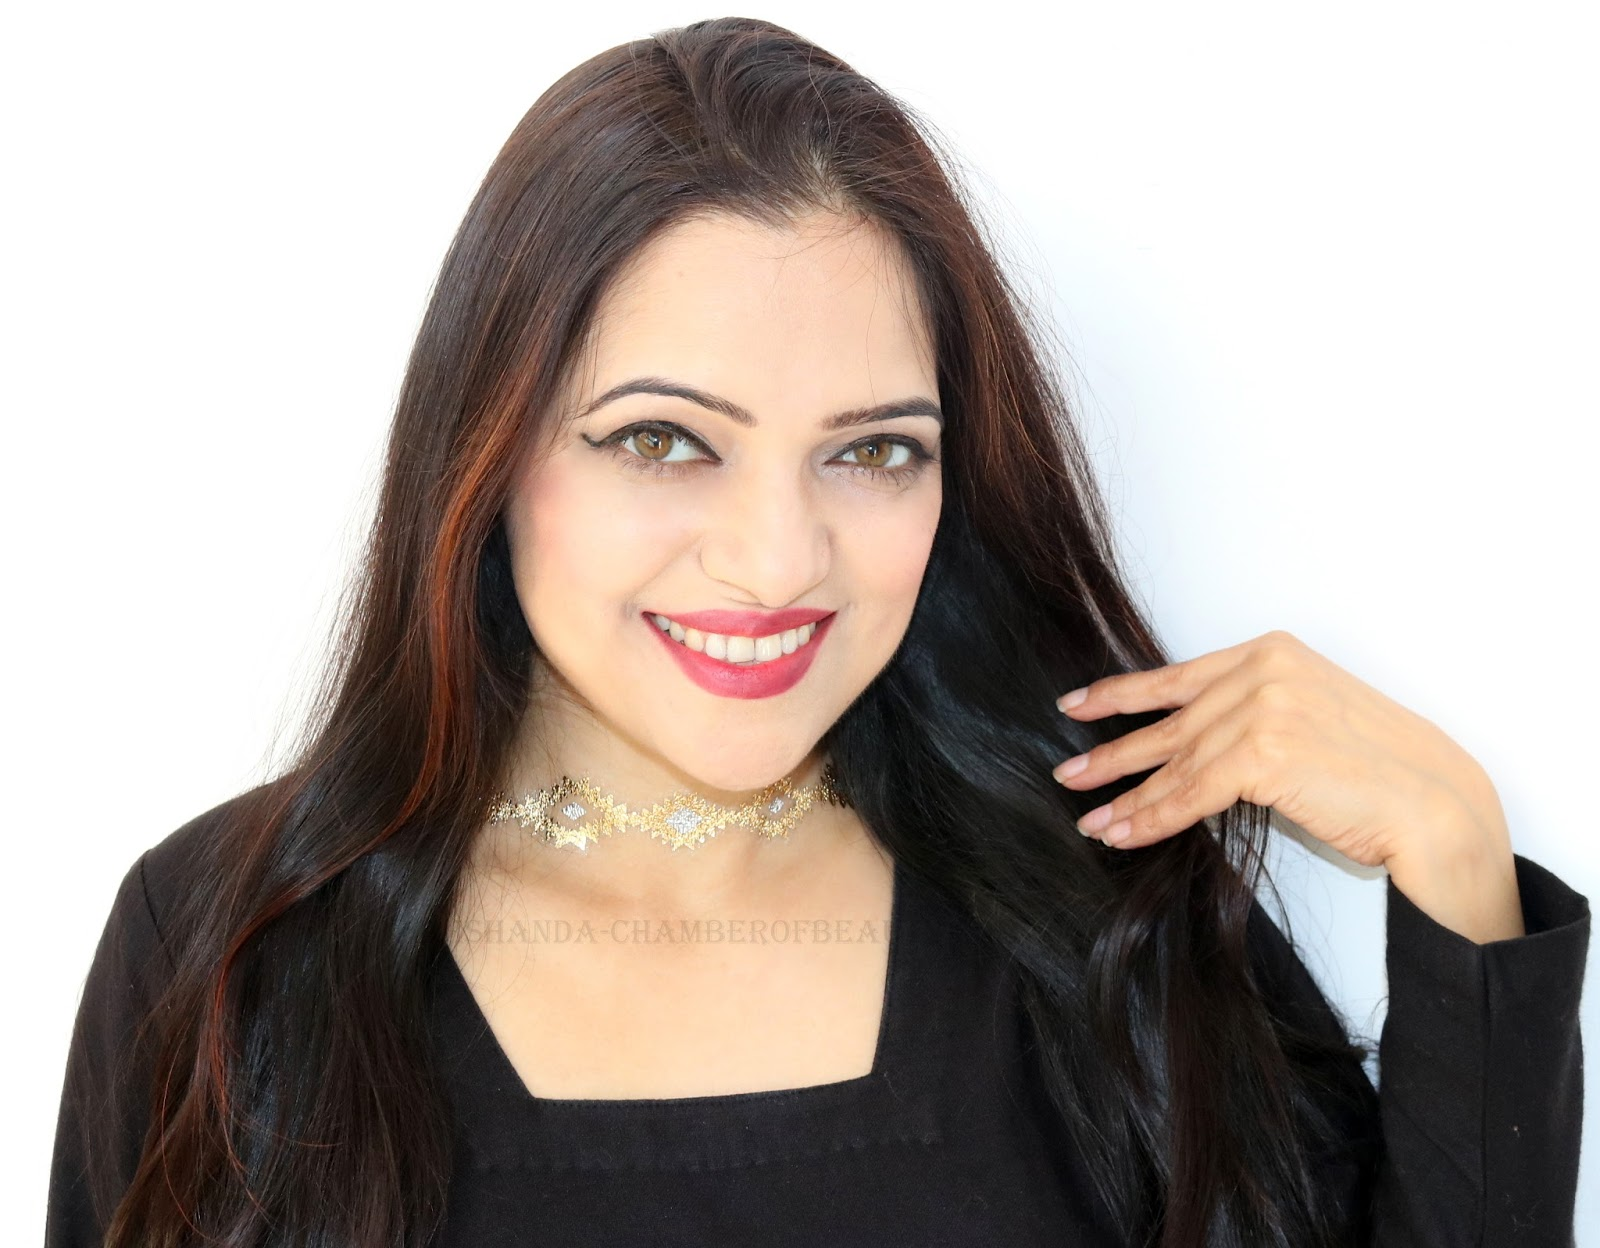 www.rakhshanda-chamberofbeauty.com/Fall Makeup Look - Burgundy Lips with Natural Eye Makeup/Indian beauty blogger